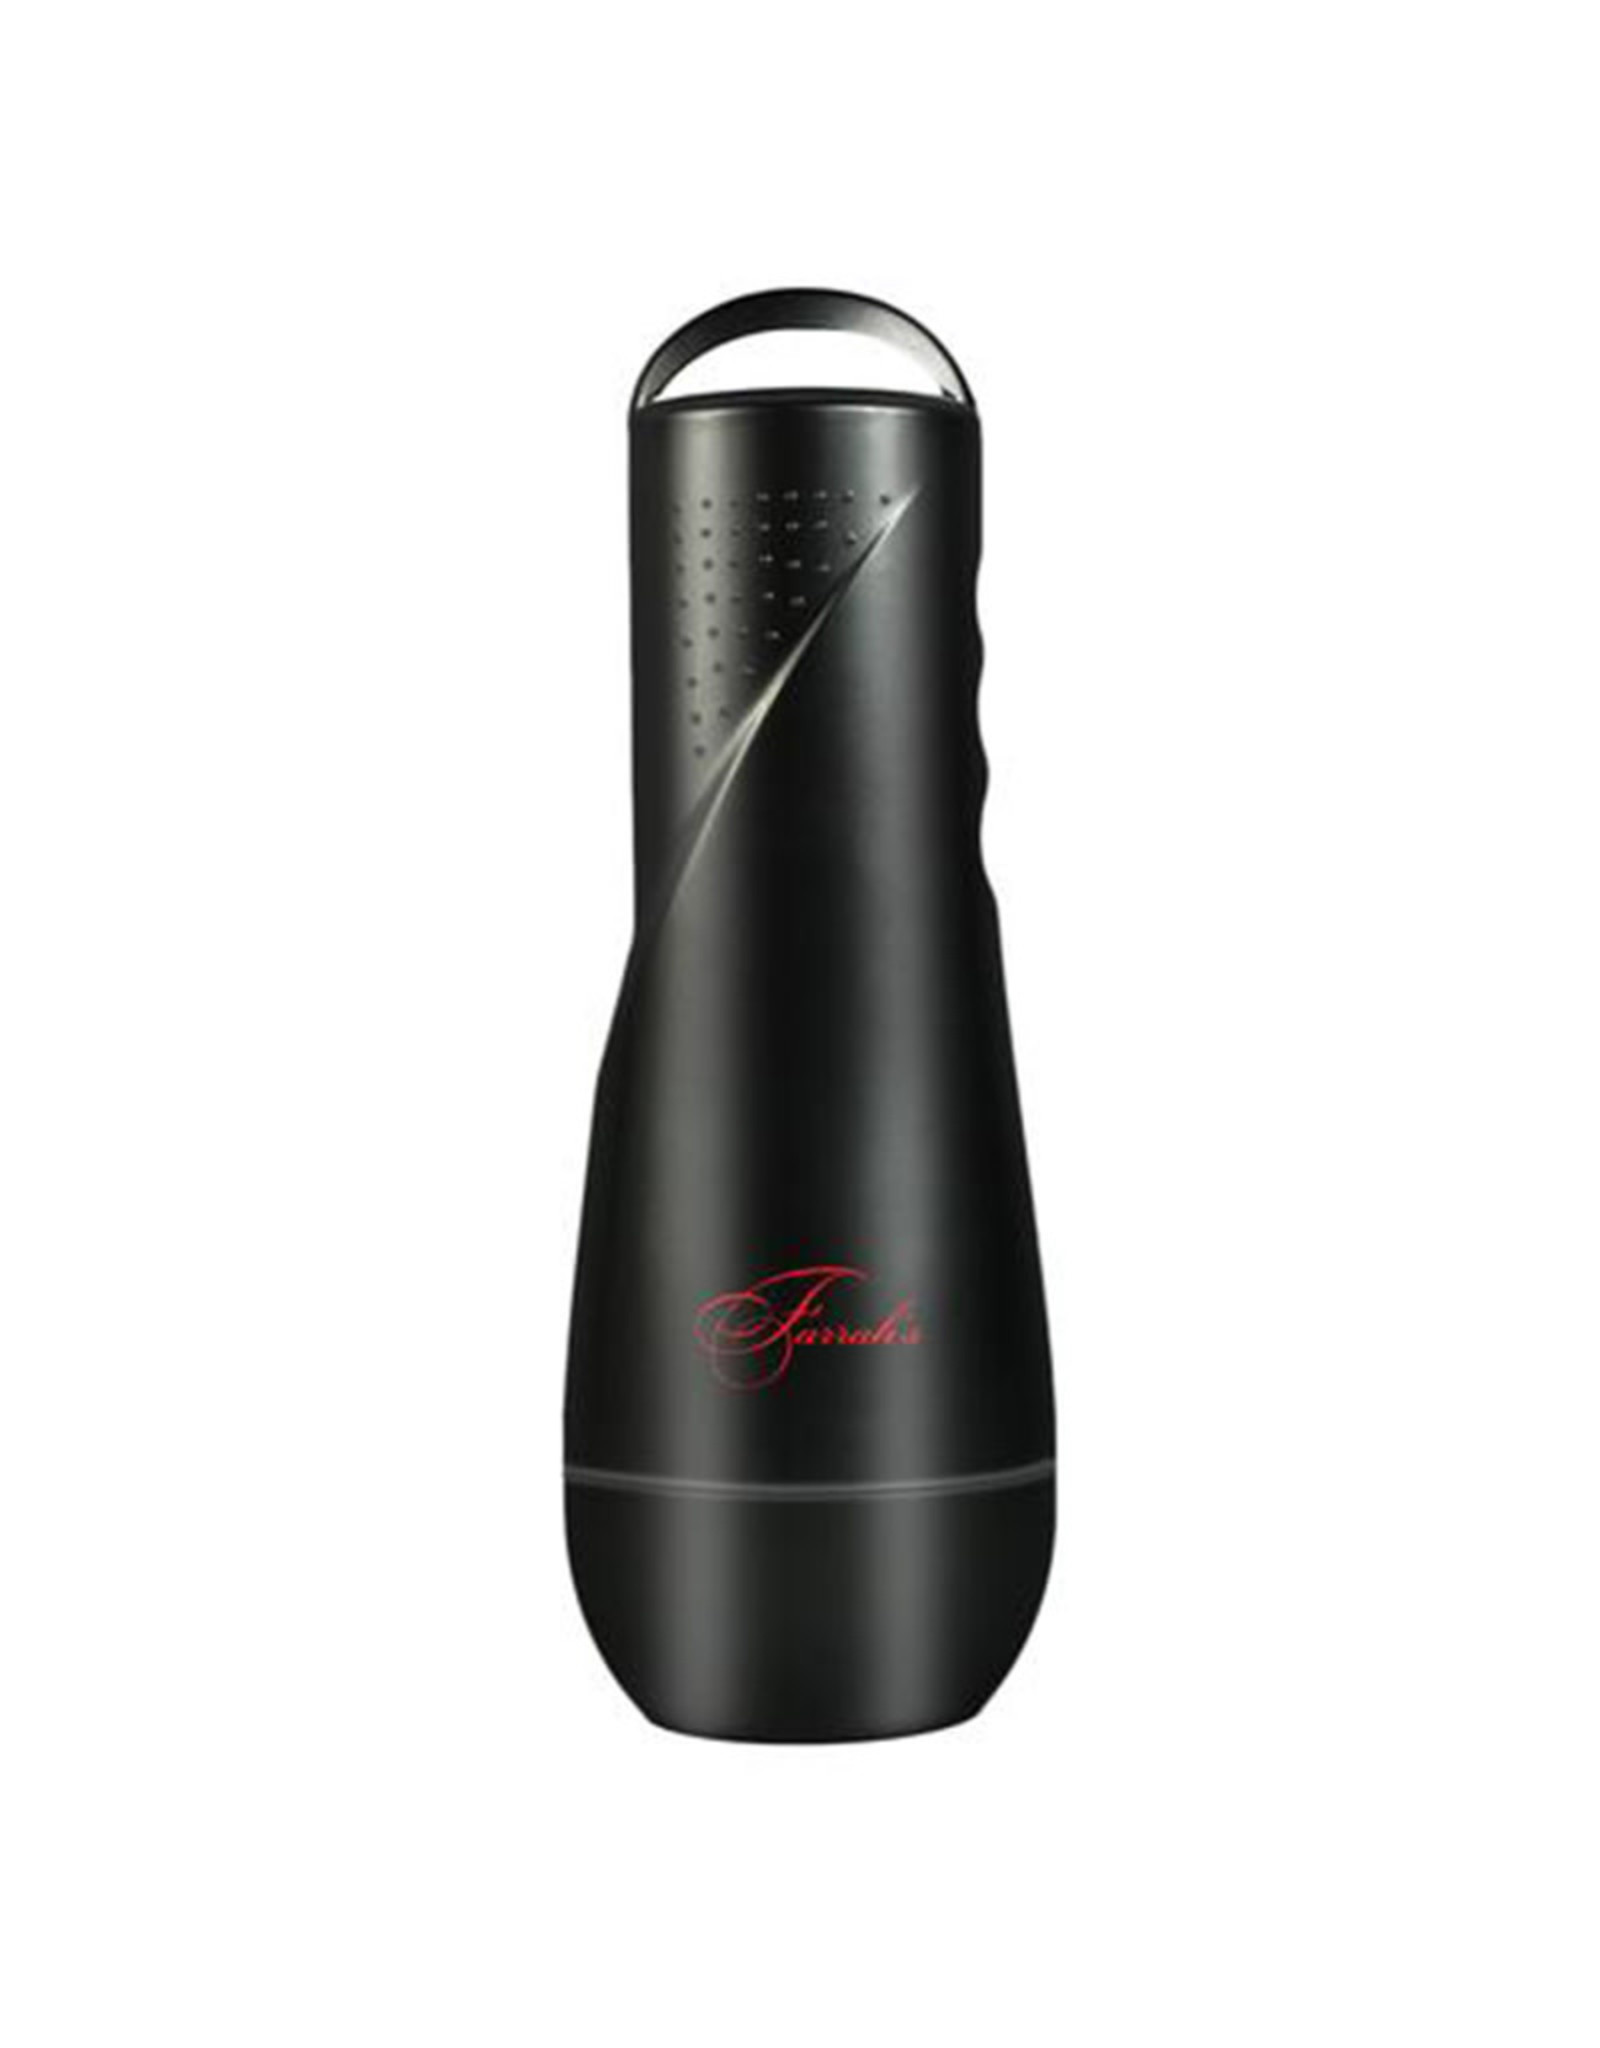 Topco sales Cyberskin Farrah's Deluxe Vibrating Stroker